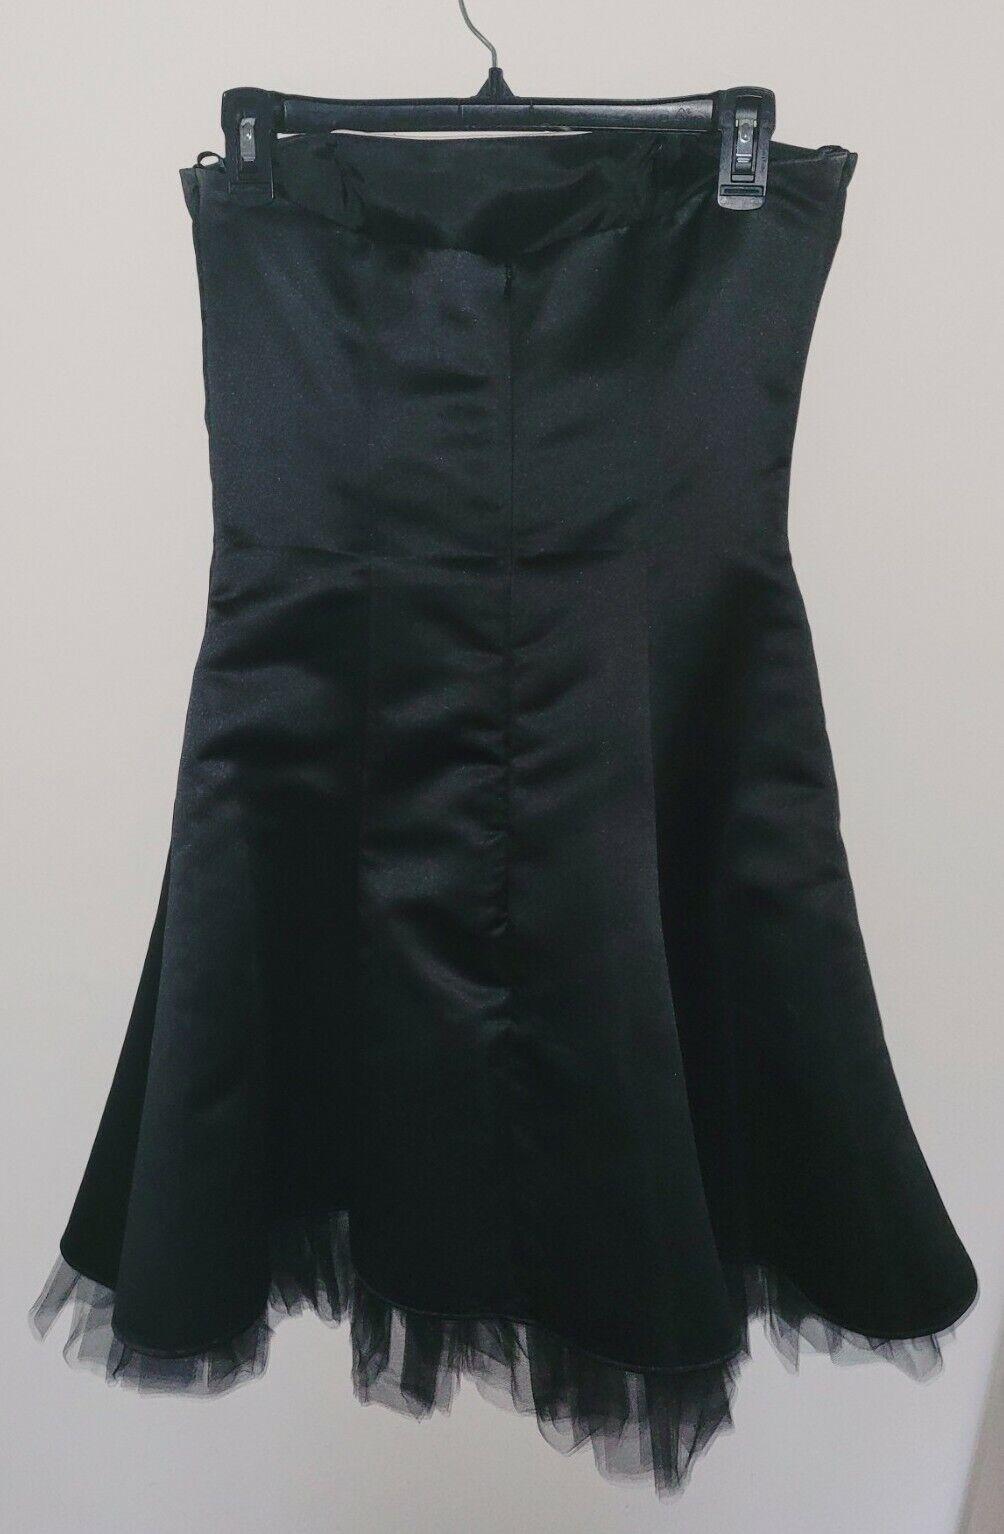 Jessica McClintock for Gunne Sax Tuxedo Dress - image 2